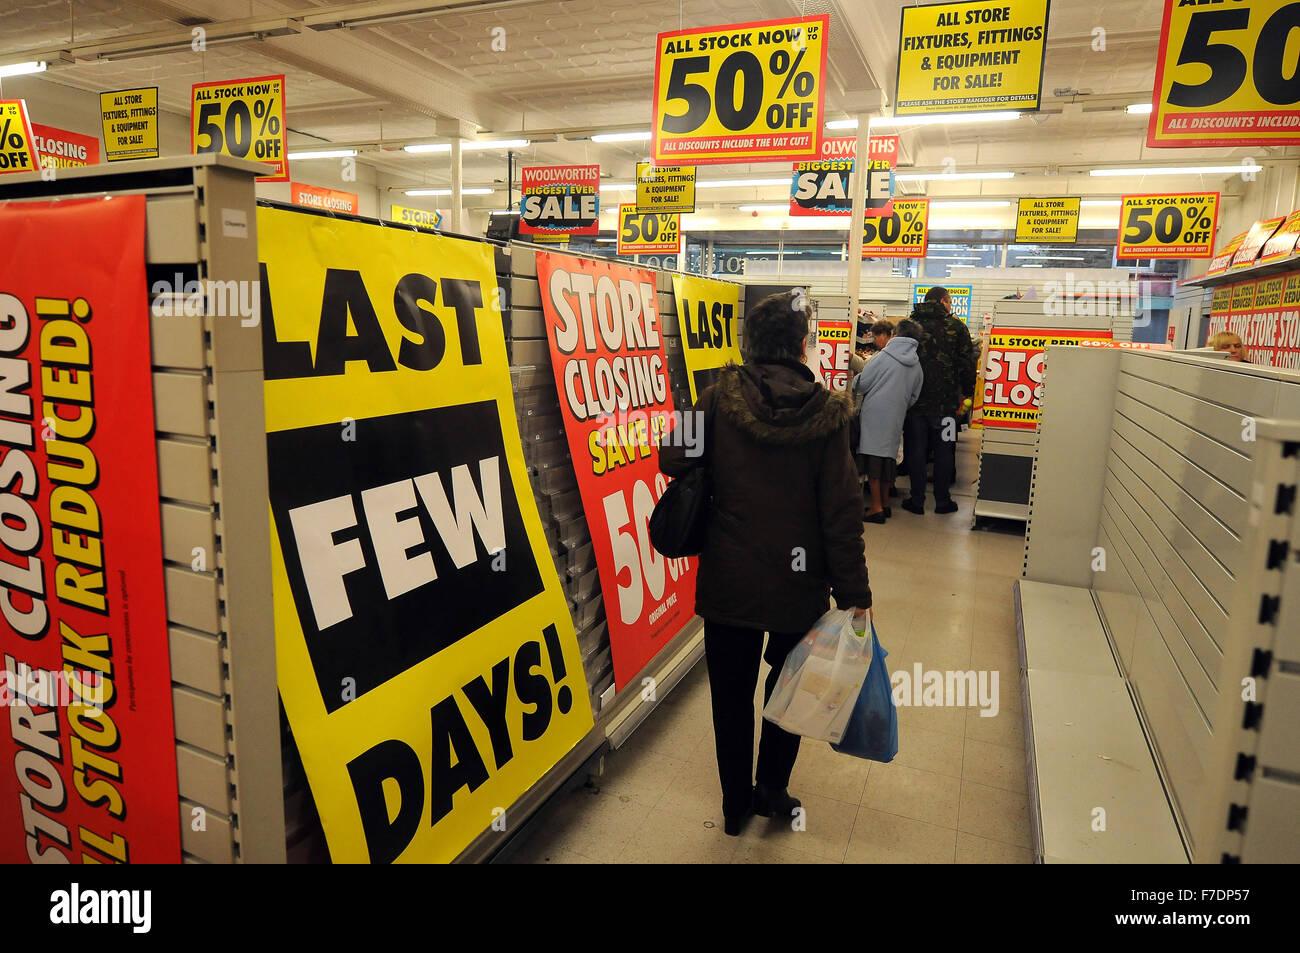 Store Closing Sale Stock Photos Amp Store Closing Sale Stock